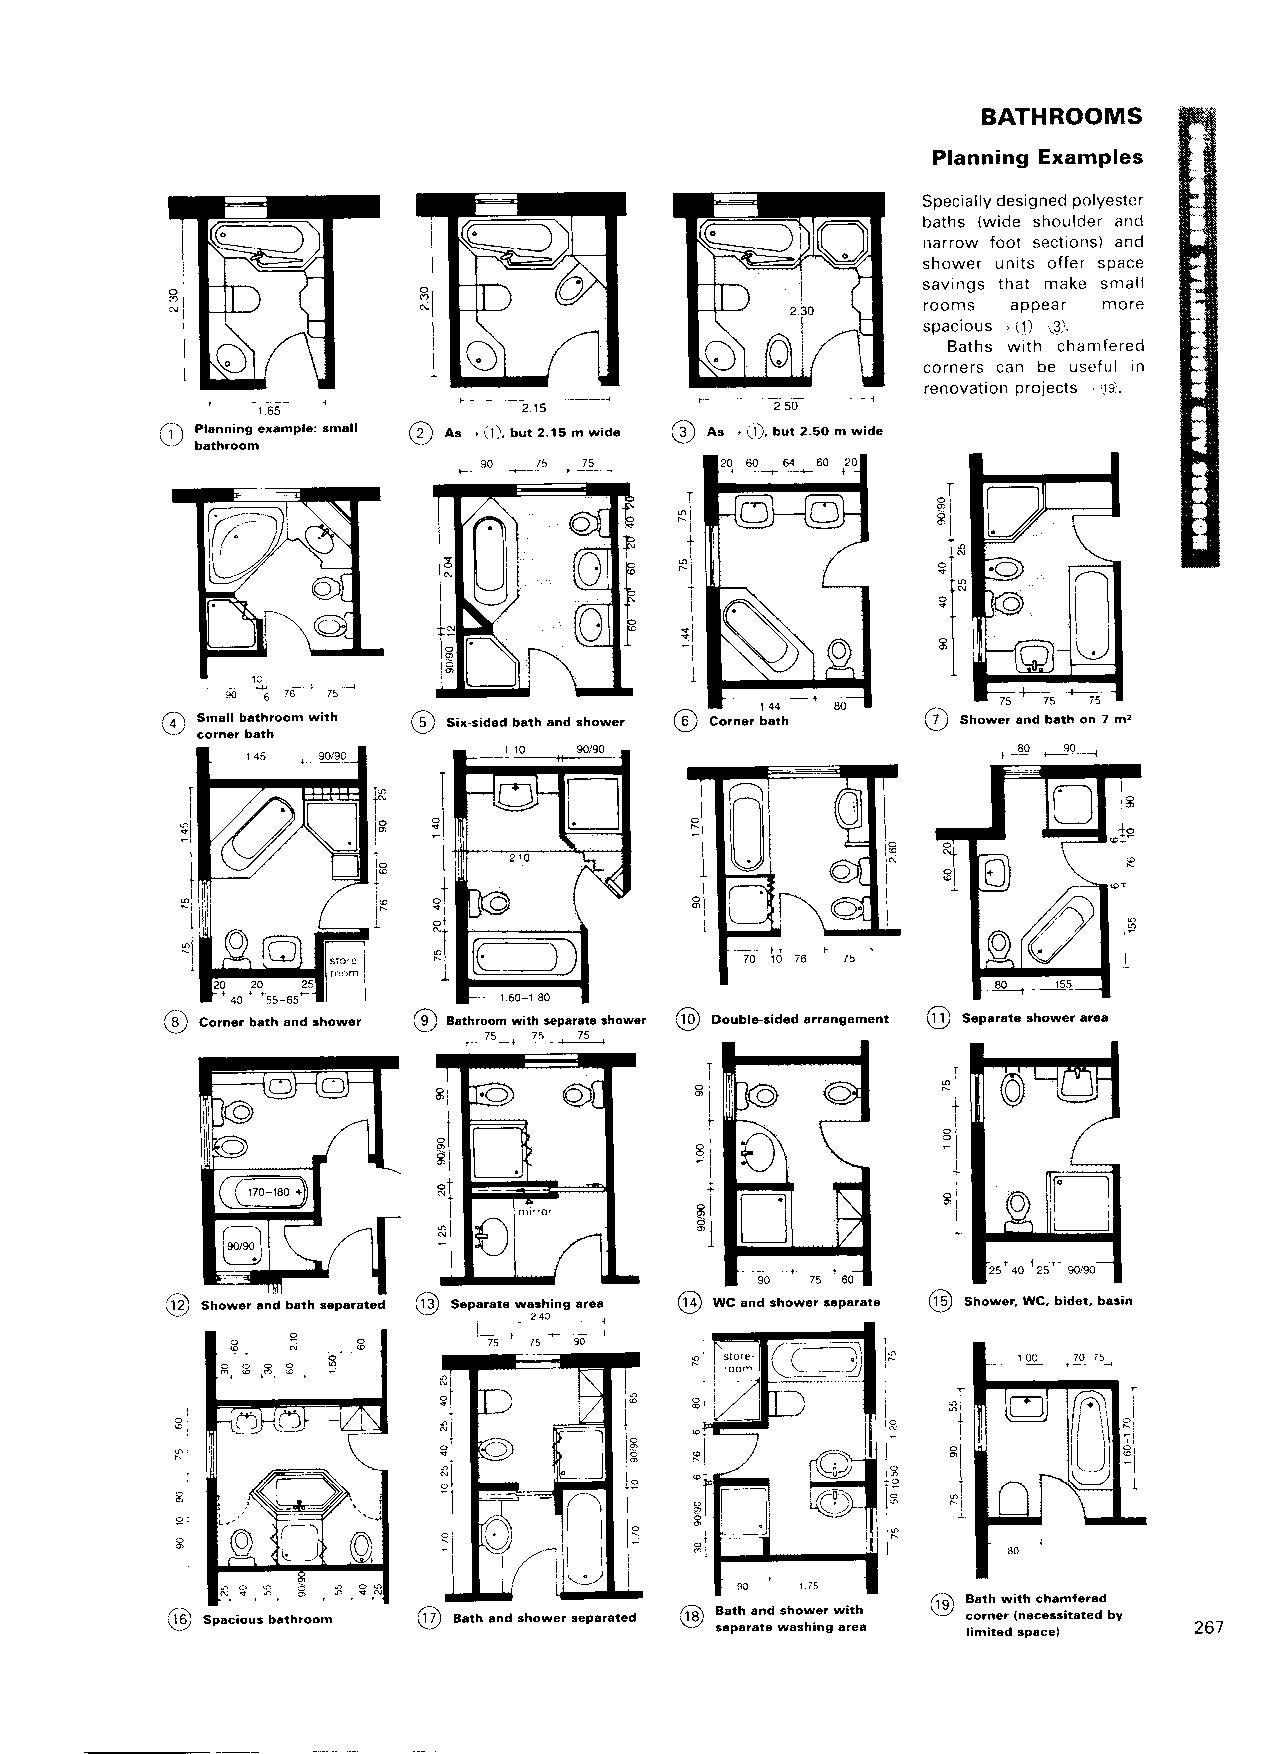 Small Bathroom Floor Plans Autocad: Neufert Architects Data Ed 3